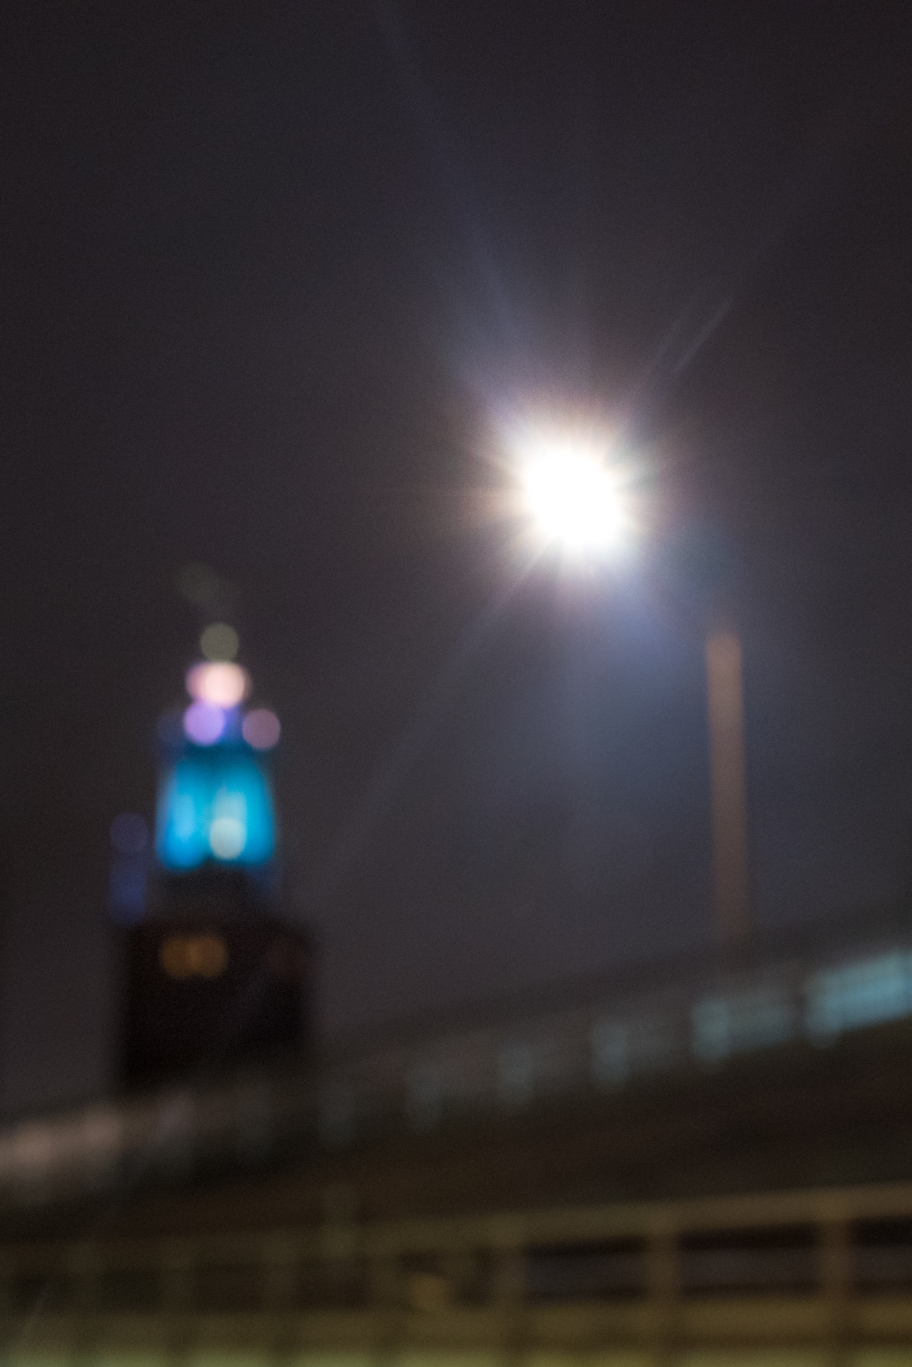 stockholms stadshus i fokus